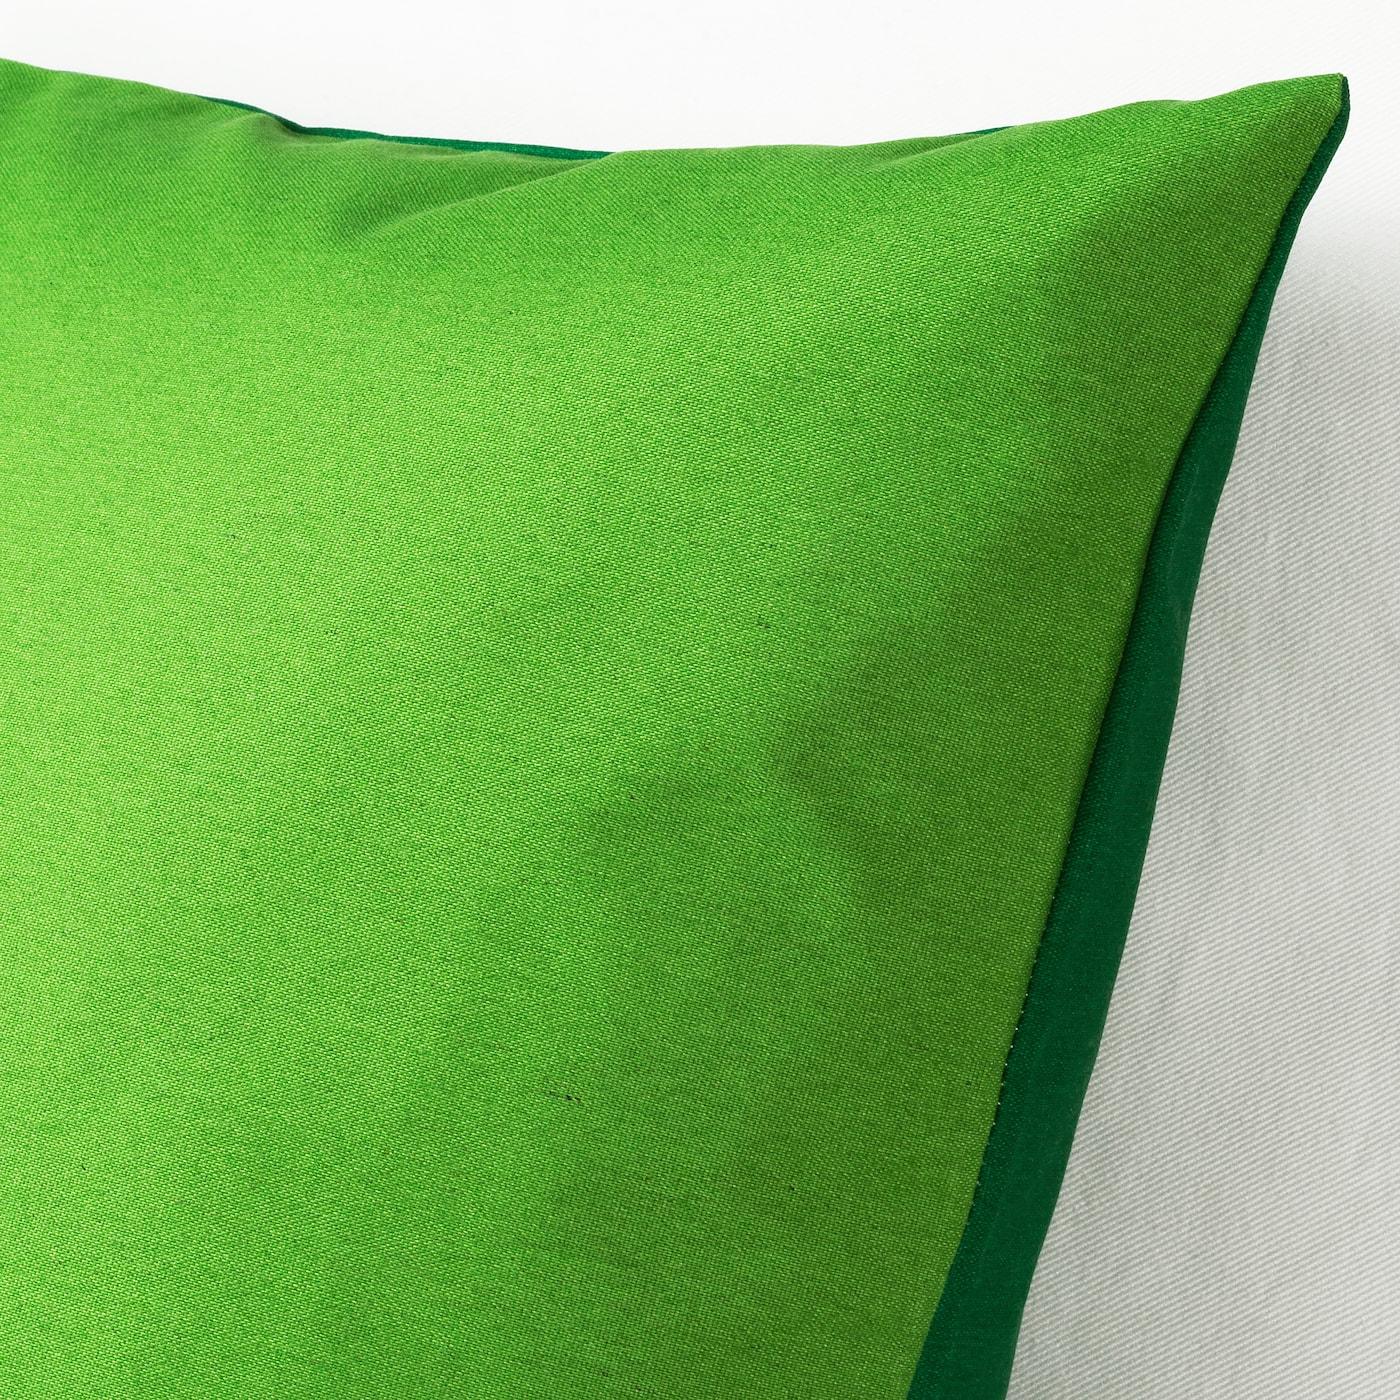 FORTSKRIDA Fodera per cuscino, verde, 50x50 cm